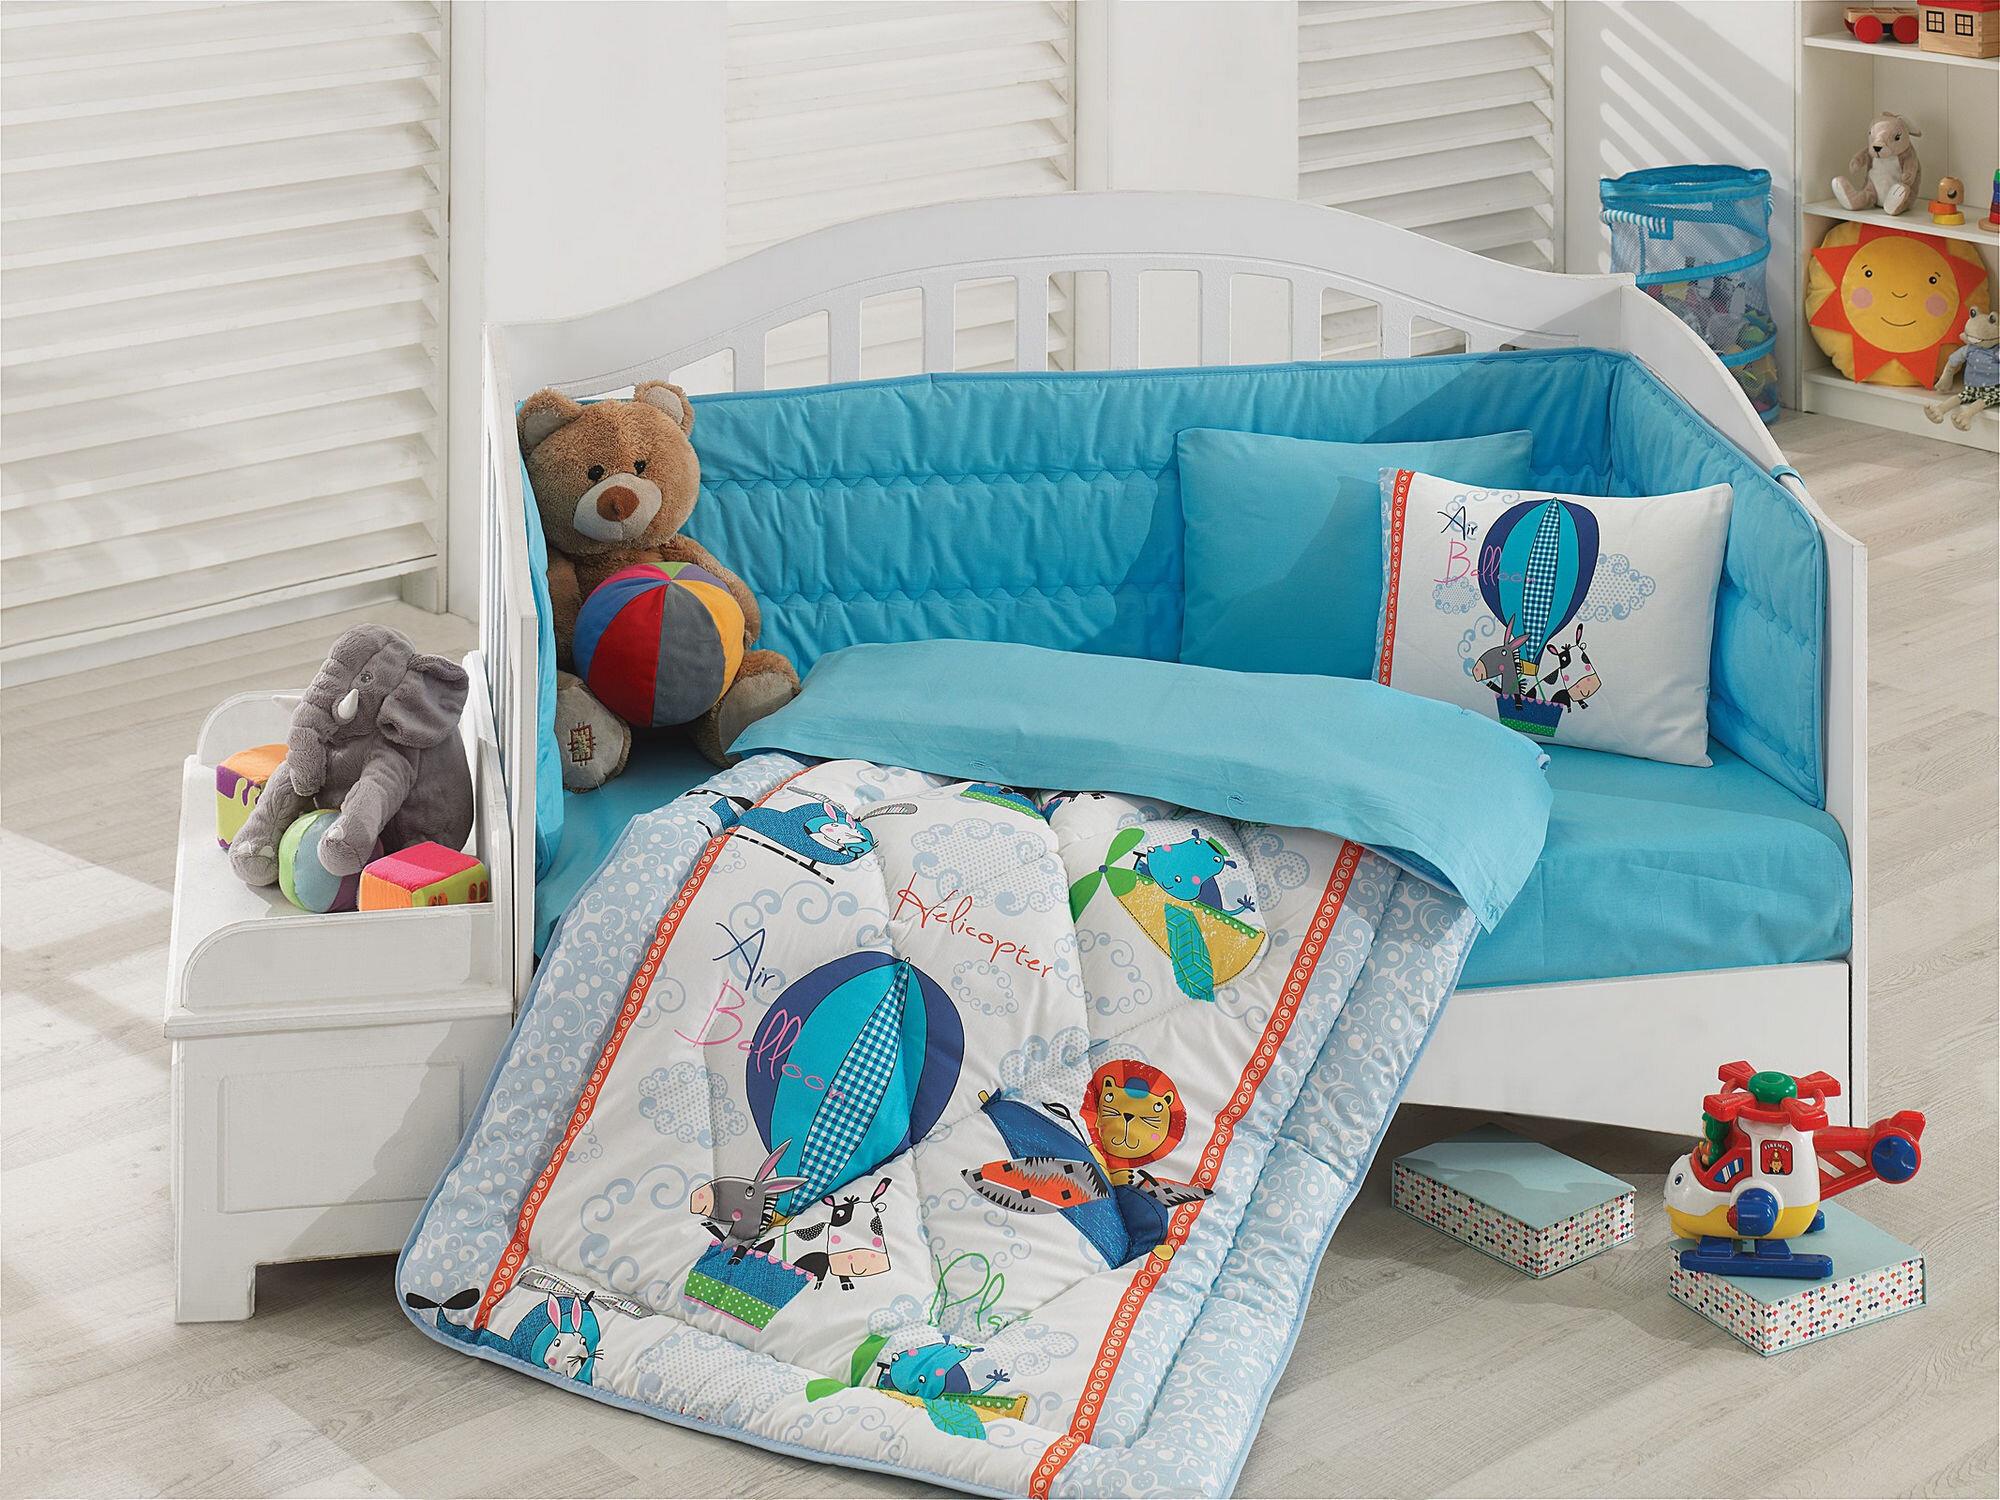 Lenjerie de pat pentru copii, Cotton Box, material: 100% bumbac